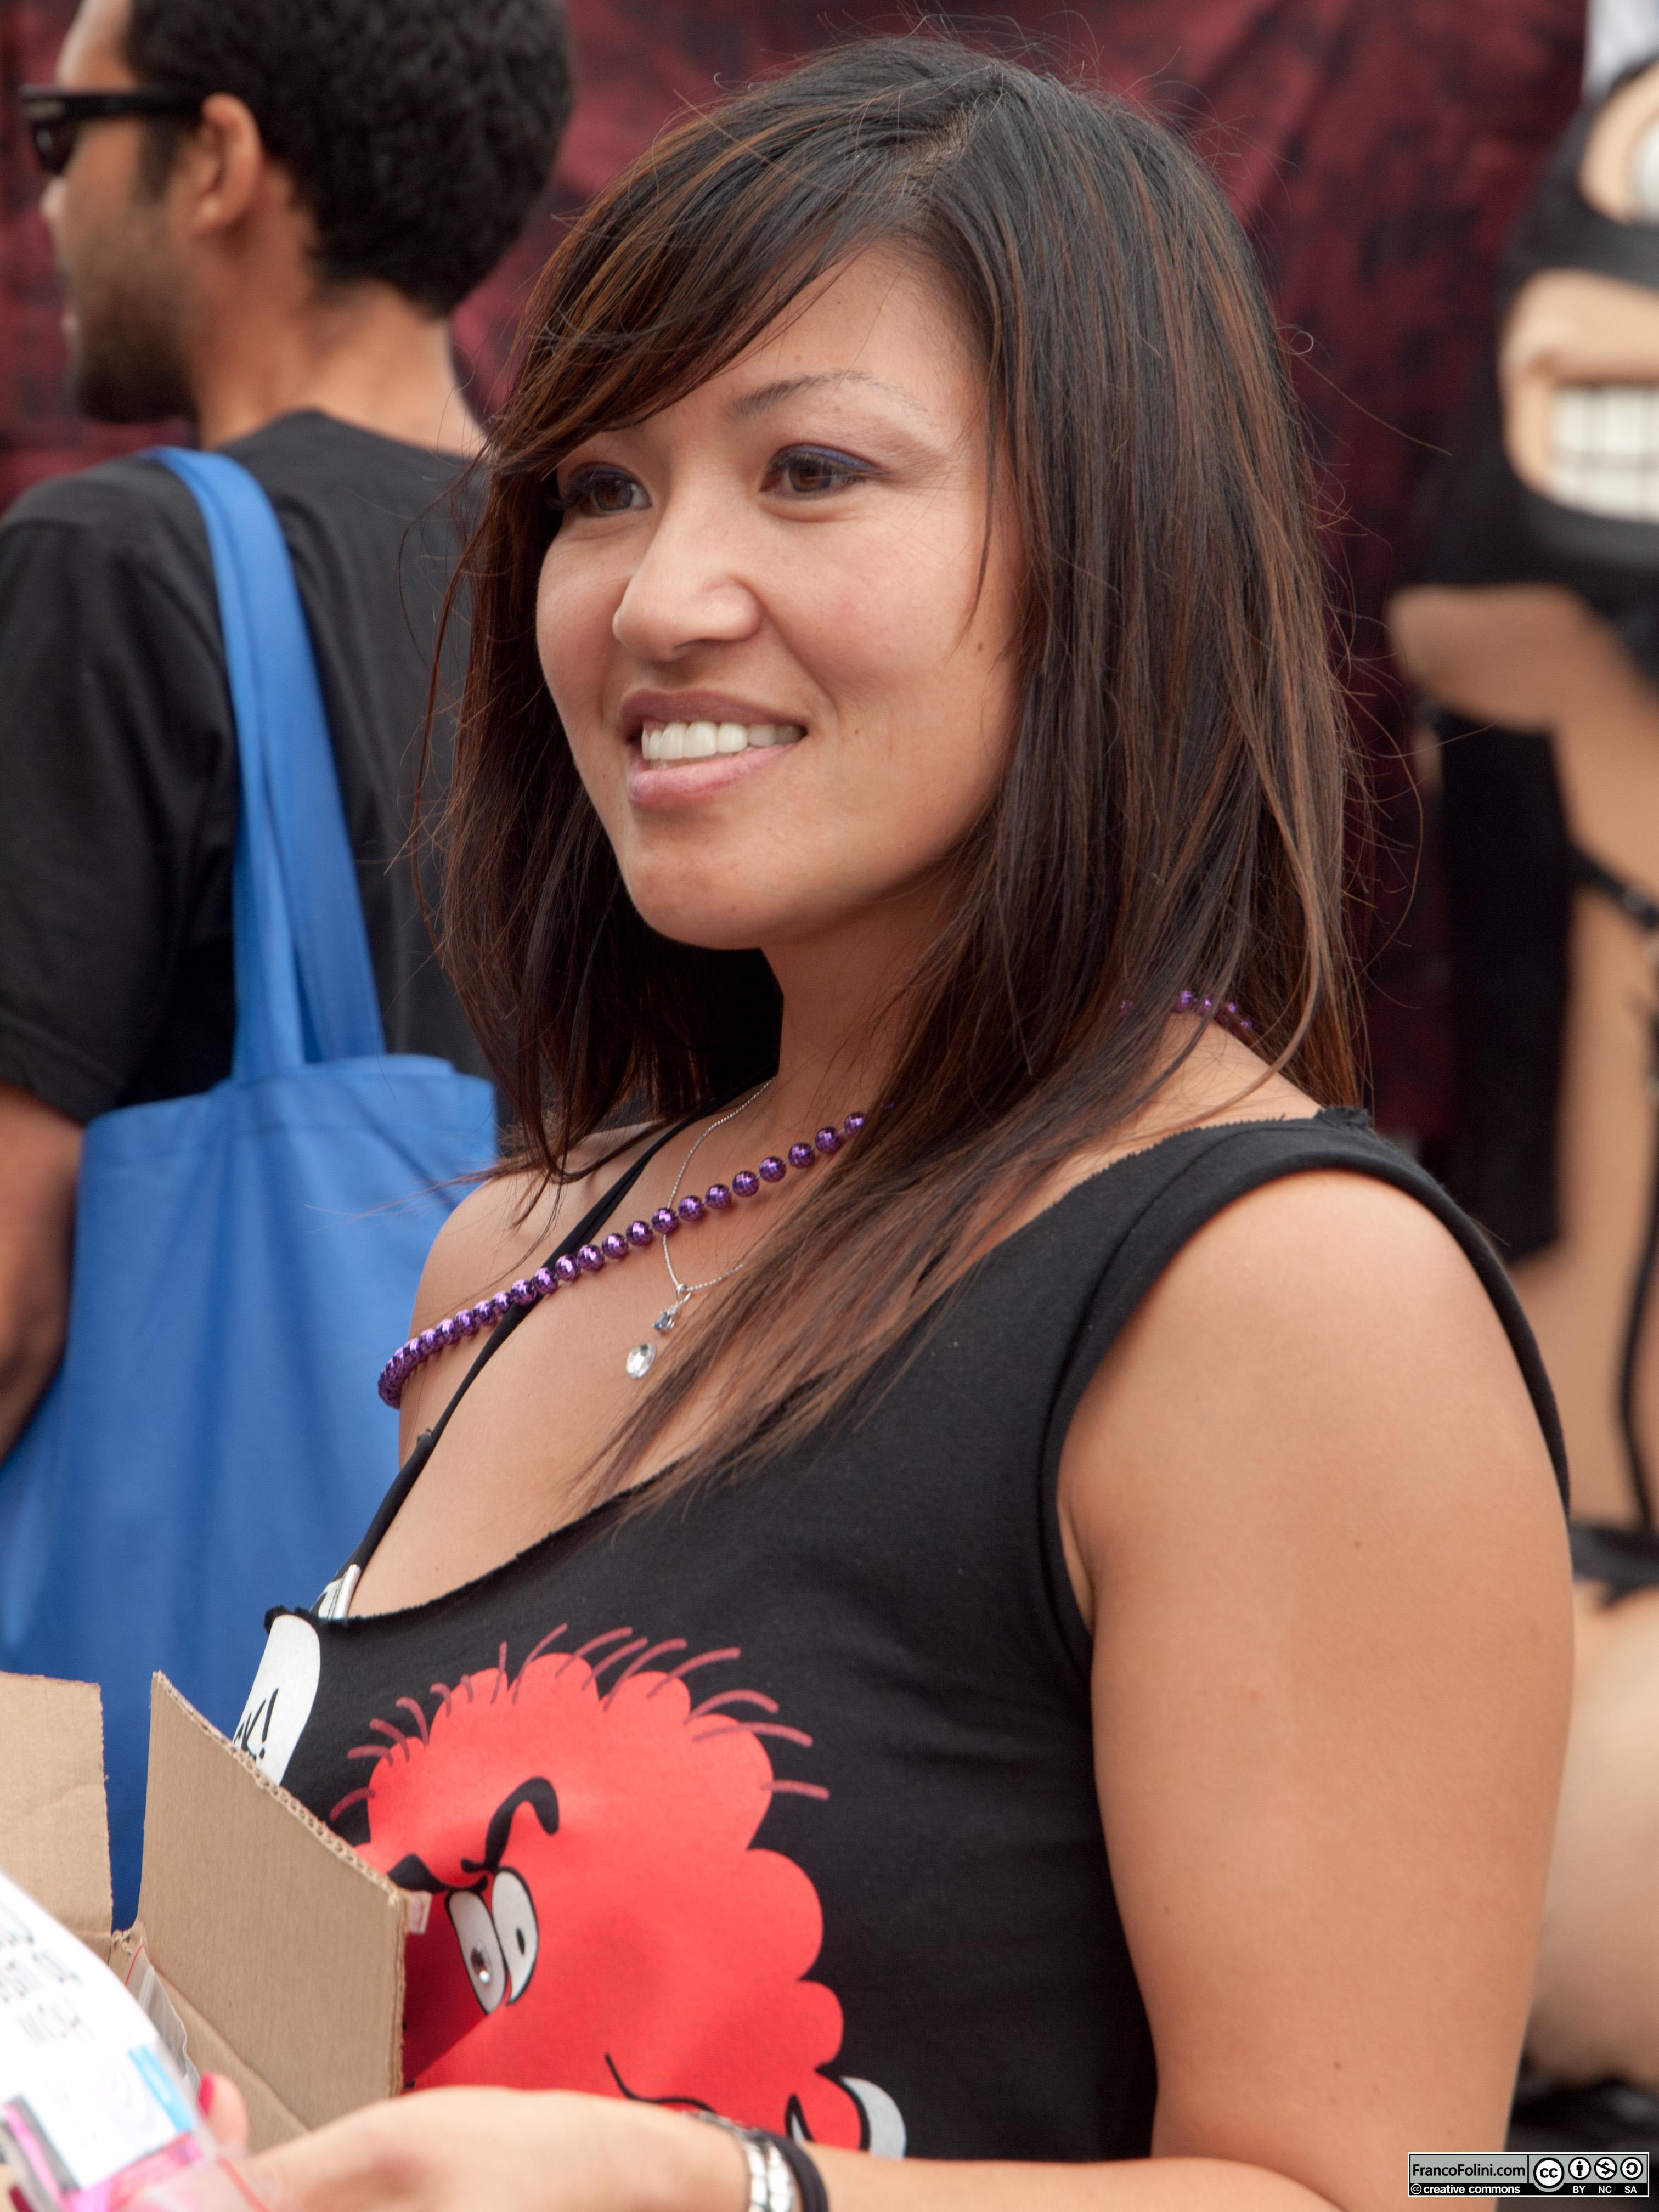 San Francisco Folsom Street Fair: woman